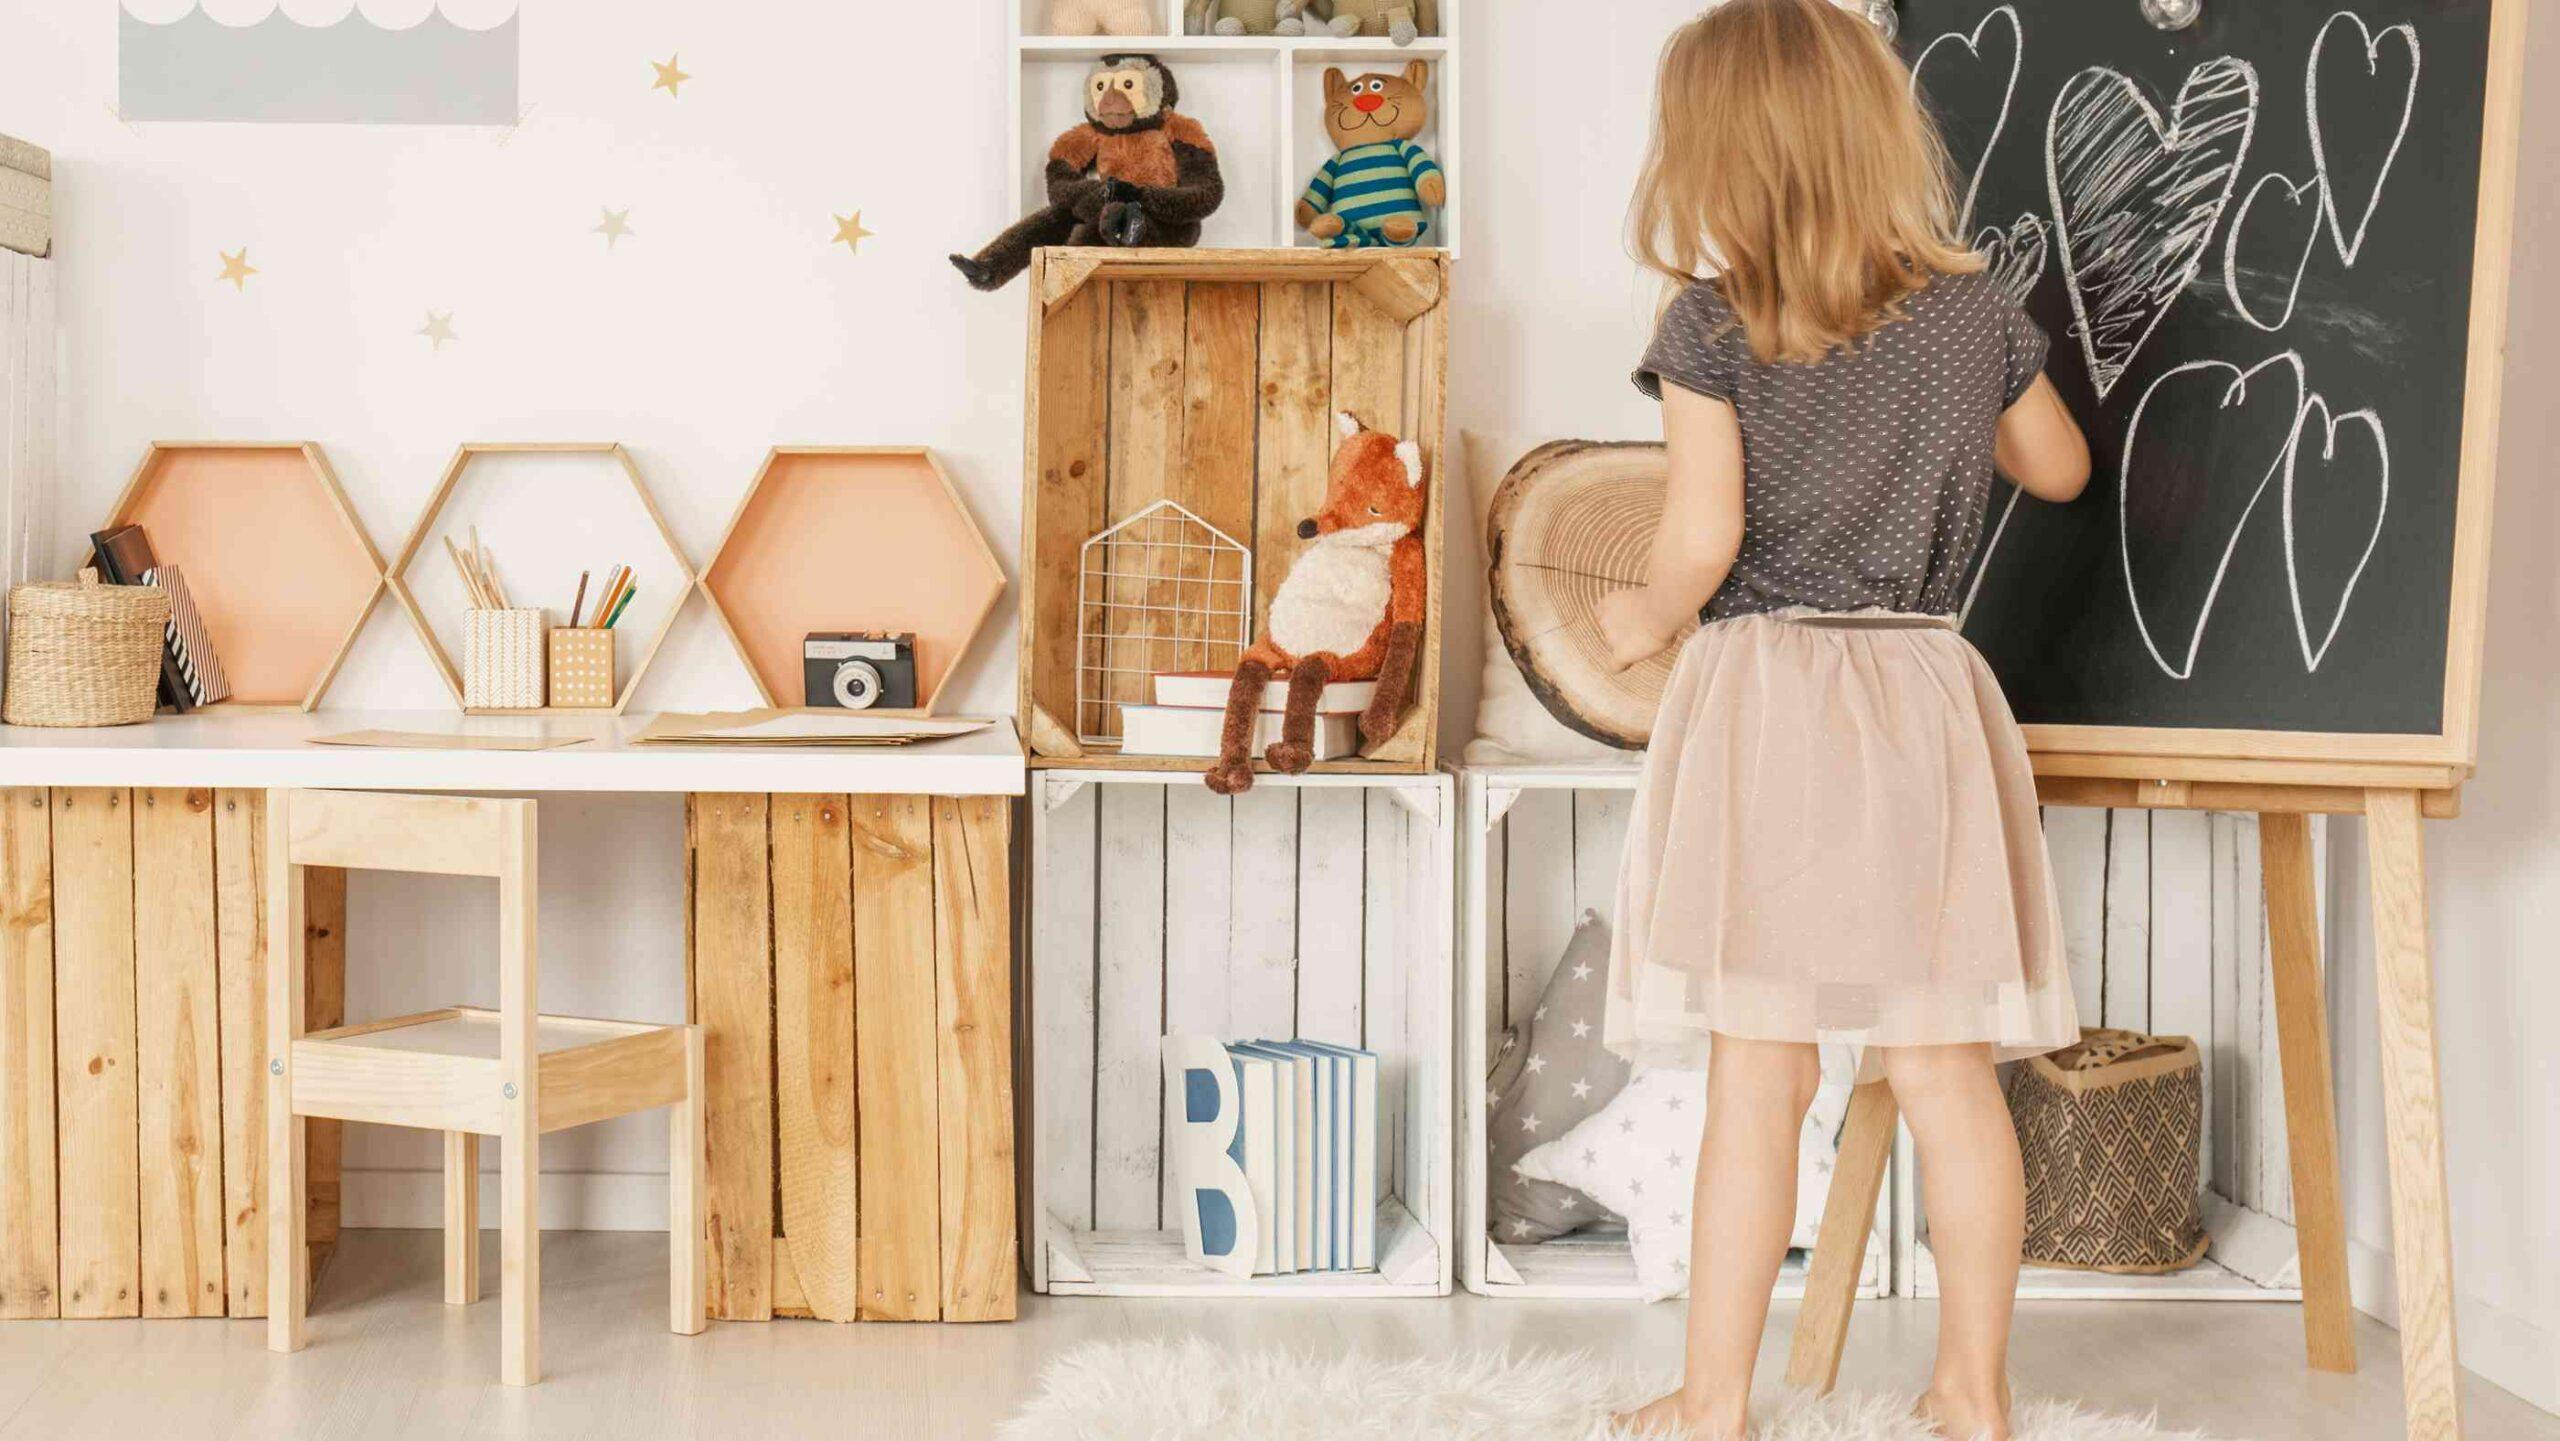 Full Size of Raumteiler Frs Kinderzimmer Trennwand Ideen Zum Selberbauen Regale Regal Sofa Weiß Kinderzimmer Raumteiler Kinderzimmer